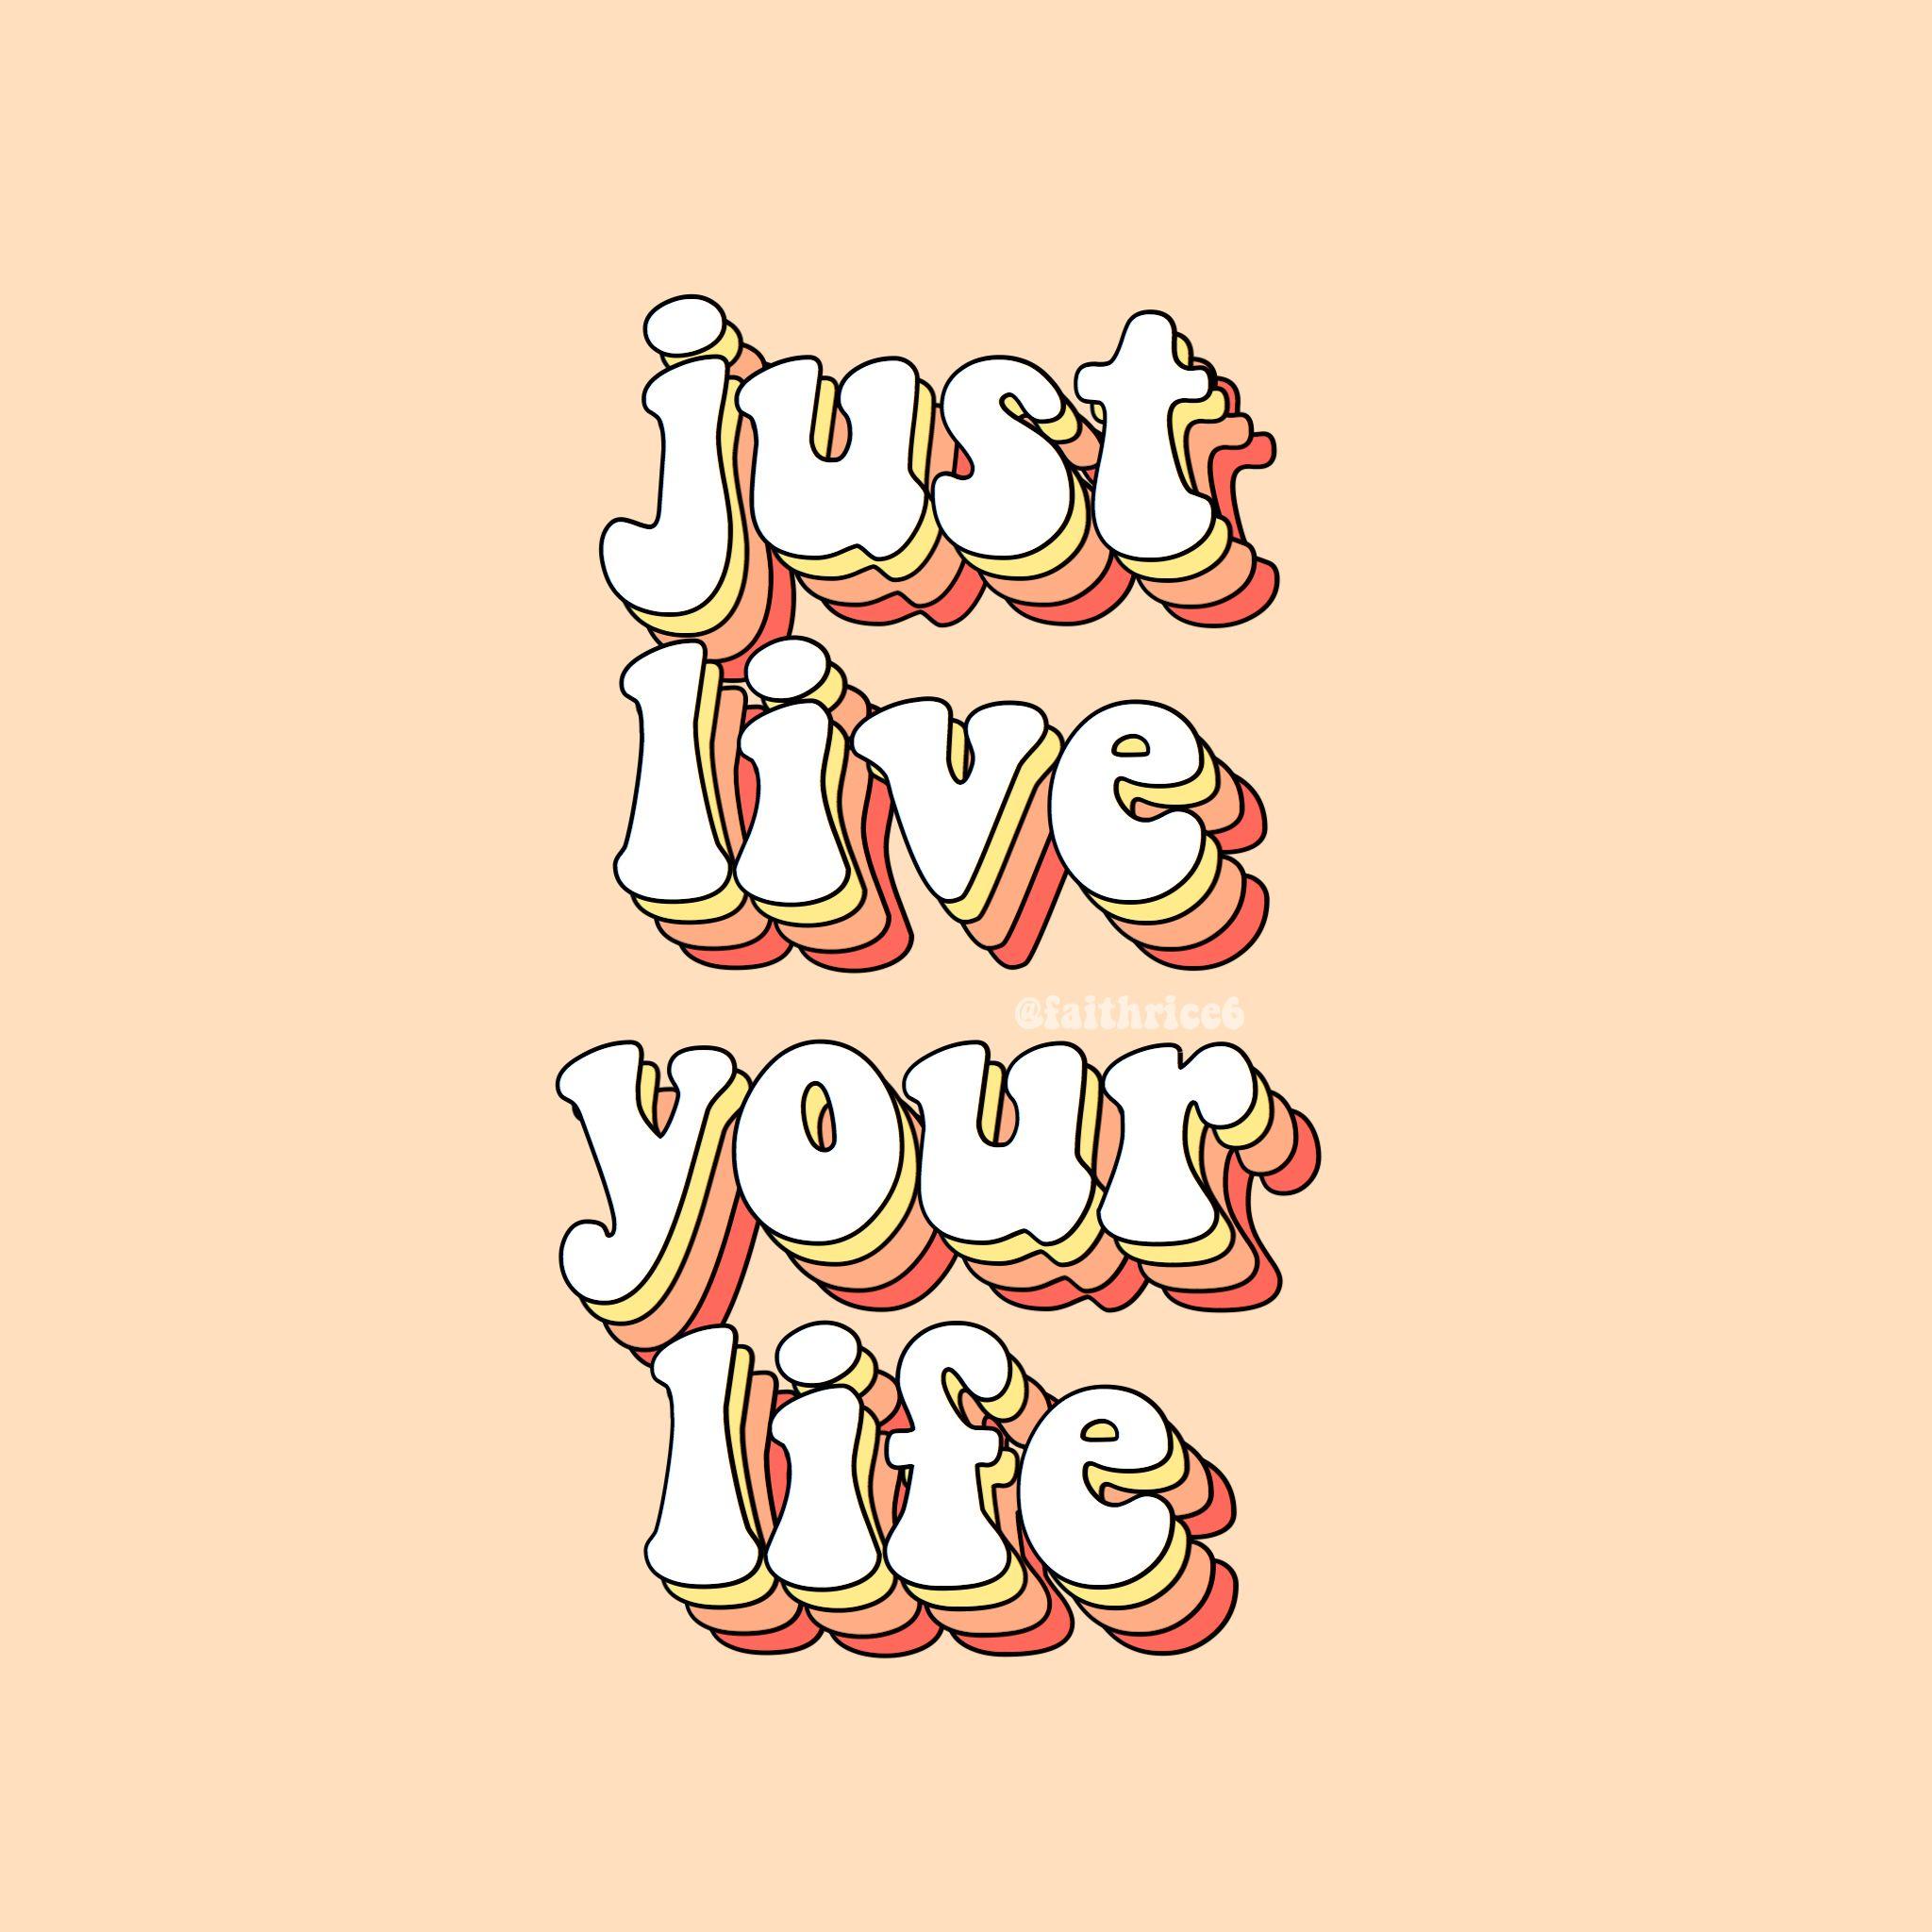 Aesthetic Tumblr Quotes Wallpaper